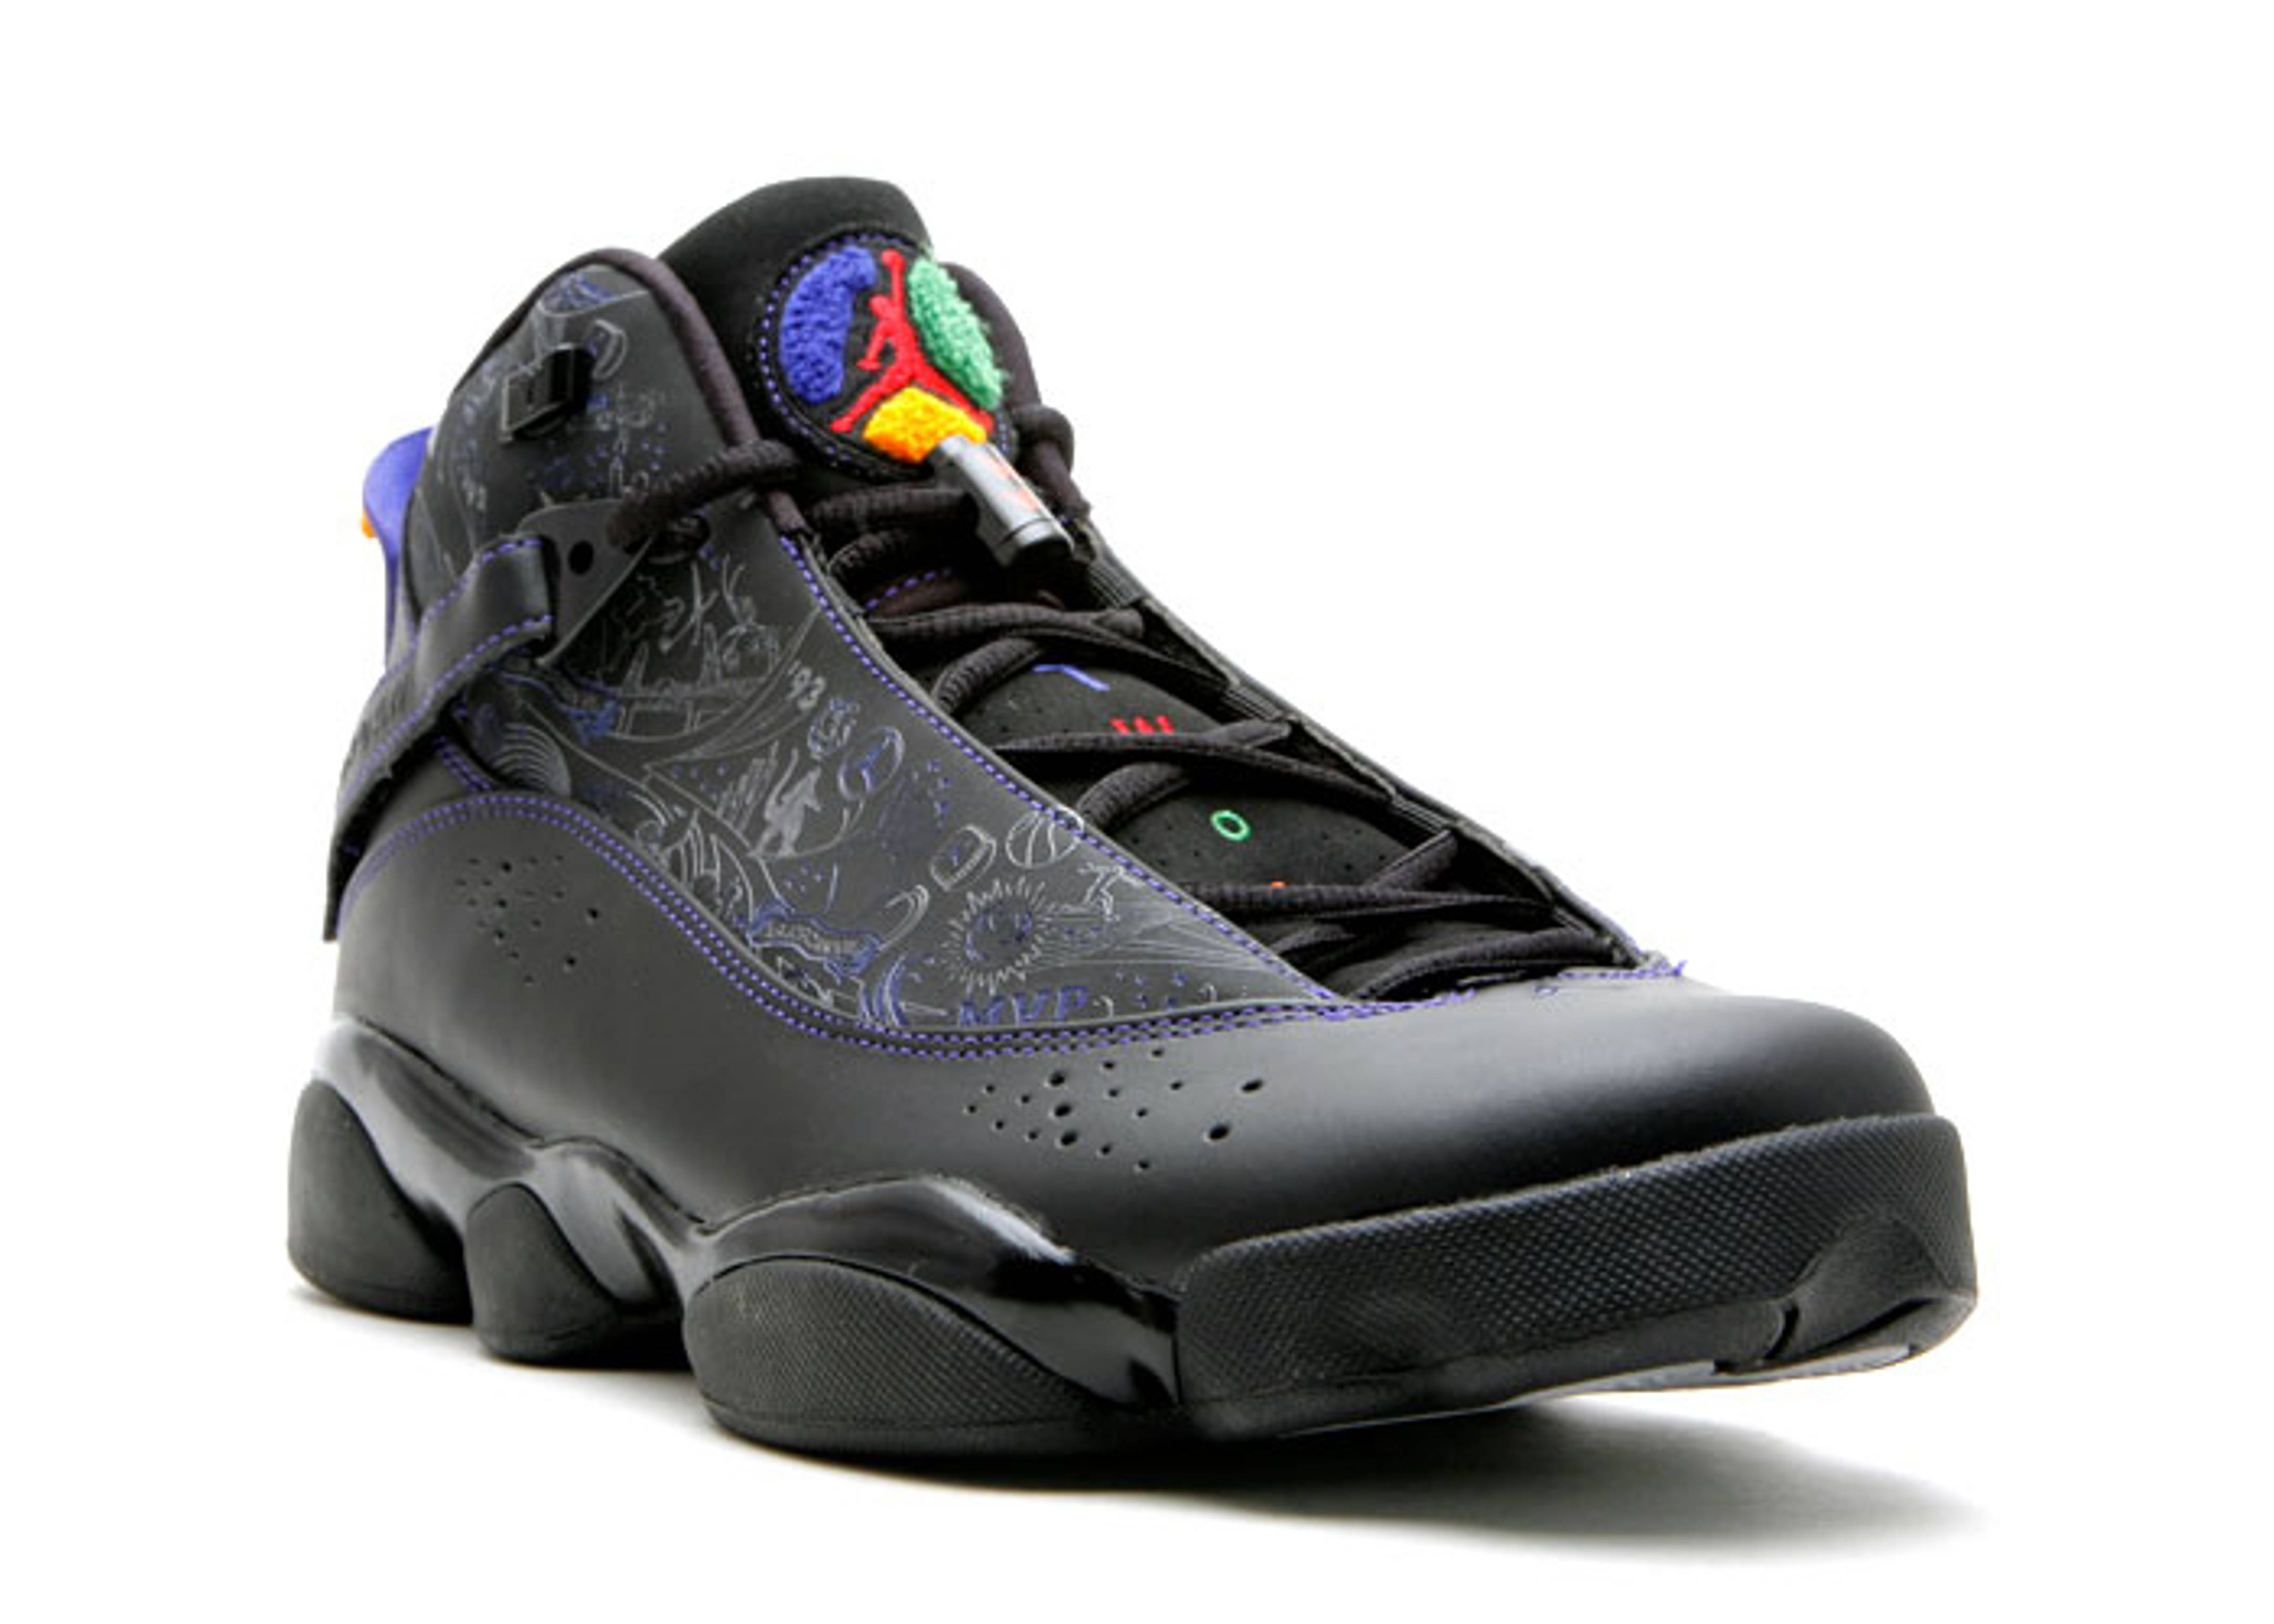 b7d5f5f1489d17 Six Ring Jordans Black And Purple Jordan Six Rings Grey